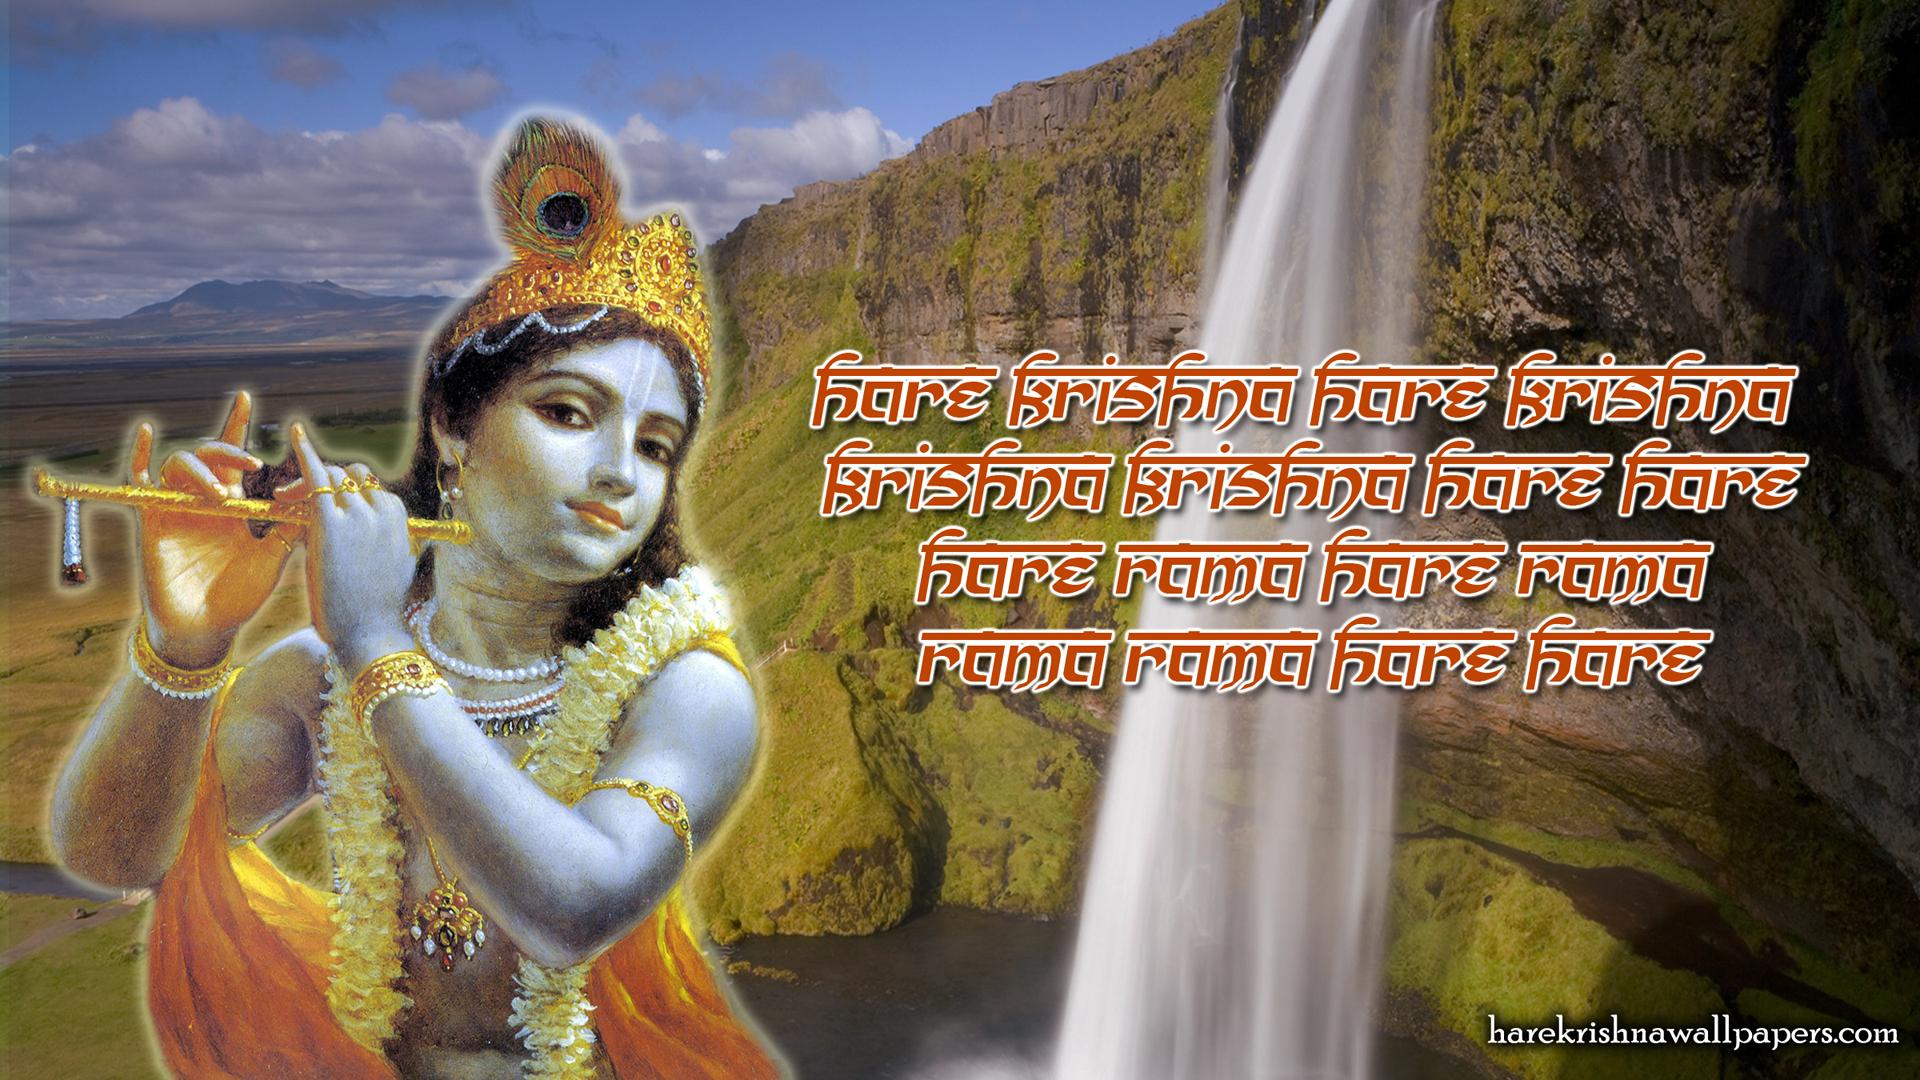 Chant Hare Krishna Mahamantra Wallpaper (002) Size 1920x1080 Download